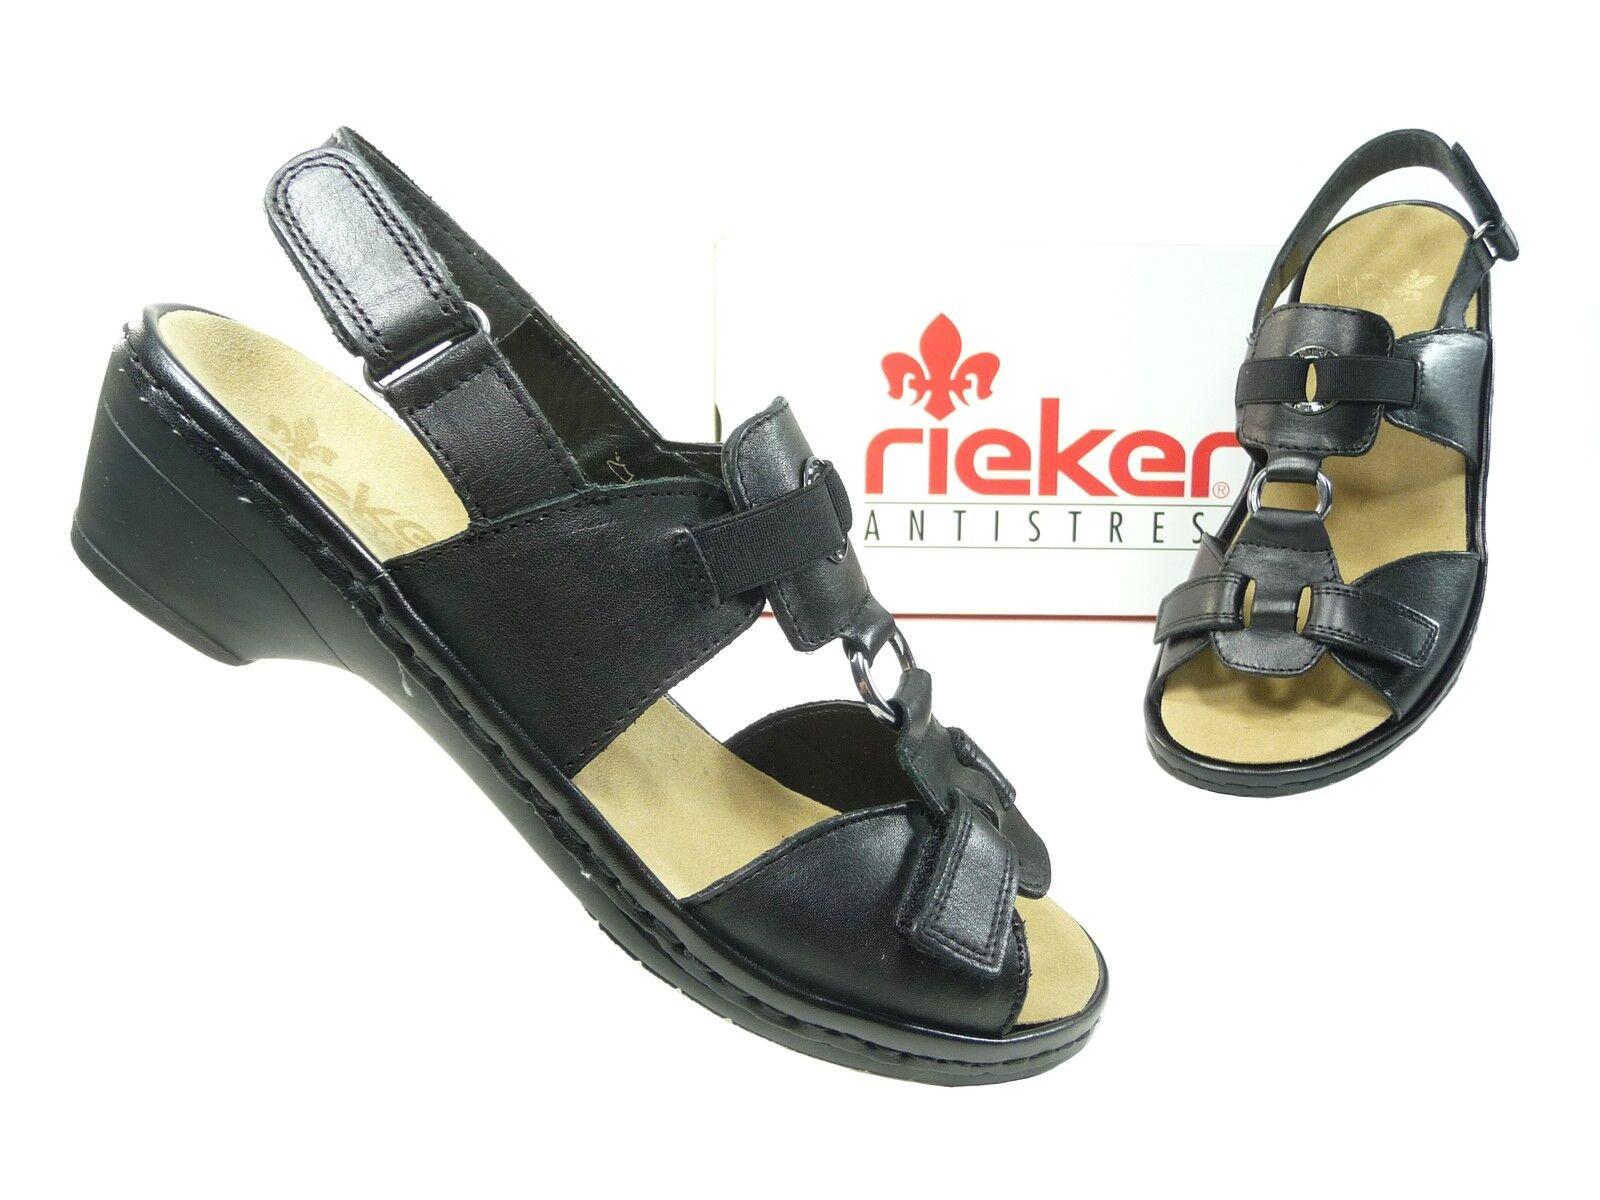 Rieker Damenschuhe Sandalen Sandaletten 65462-00 in Schwarz (Art.Nr. 65462-00 Sandaletten Adelheid) 49c4af